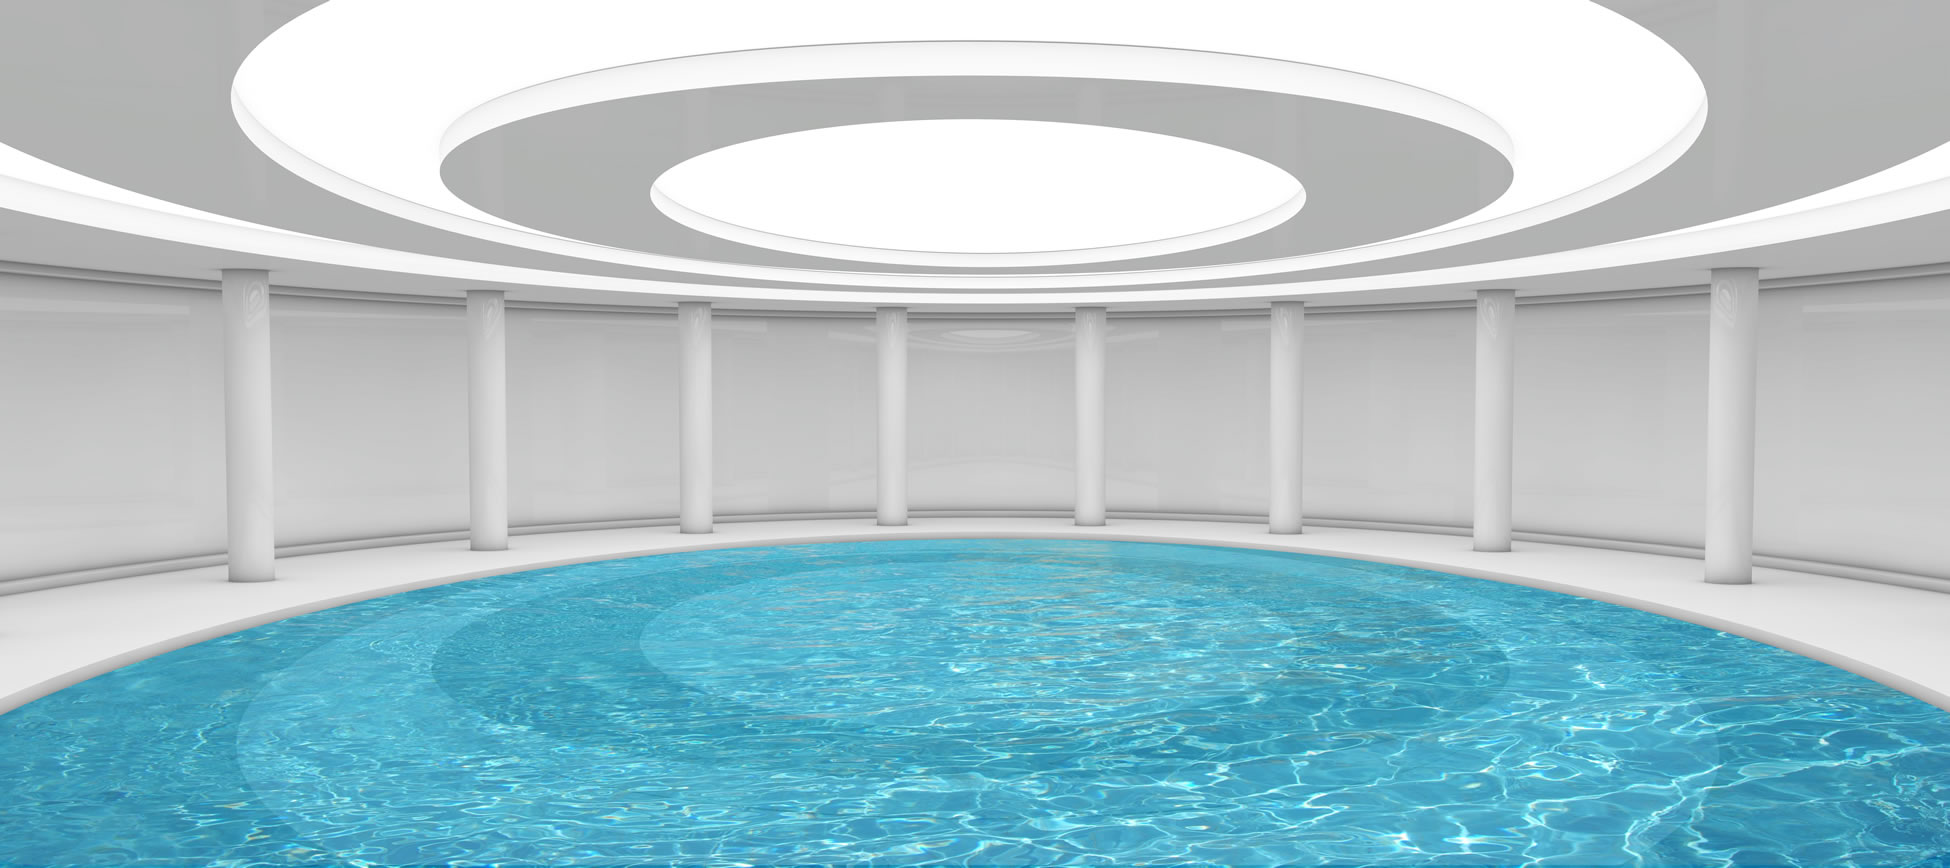 Related pictures gergi tavan barrisol barisol modelleri pictures to - Dijital Bask Gergi Tavan Sistemleri I Kl